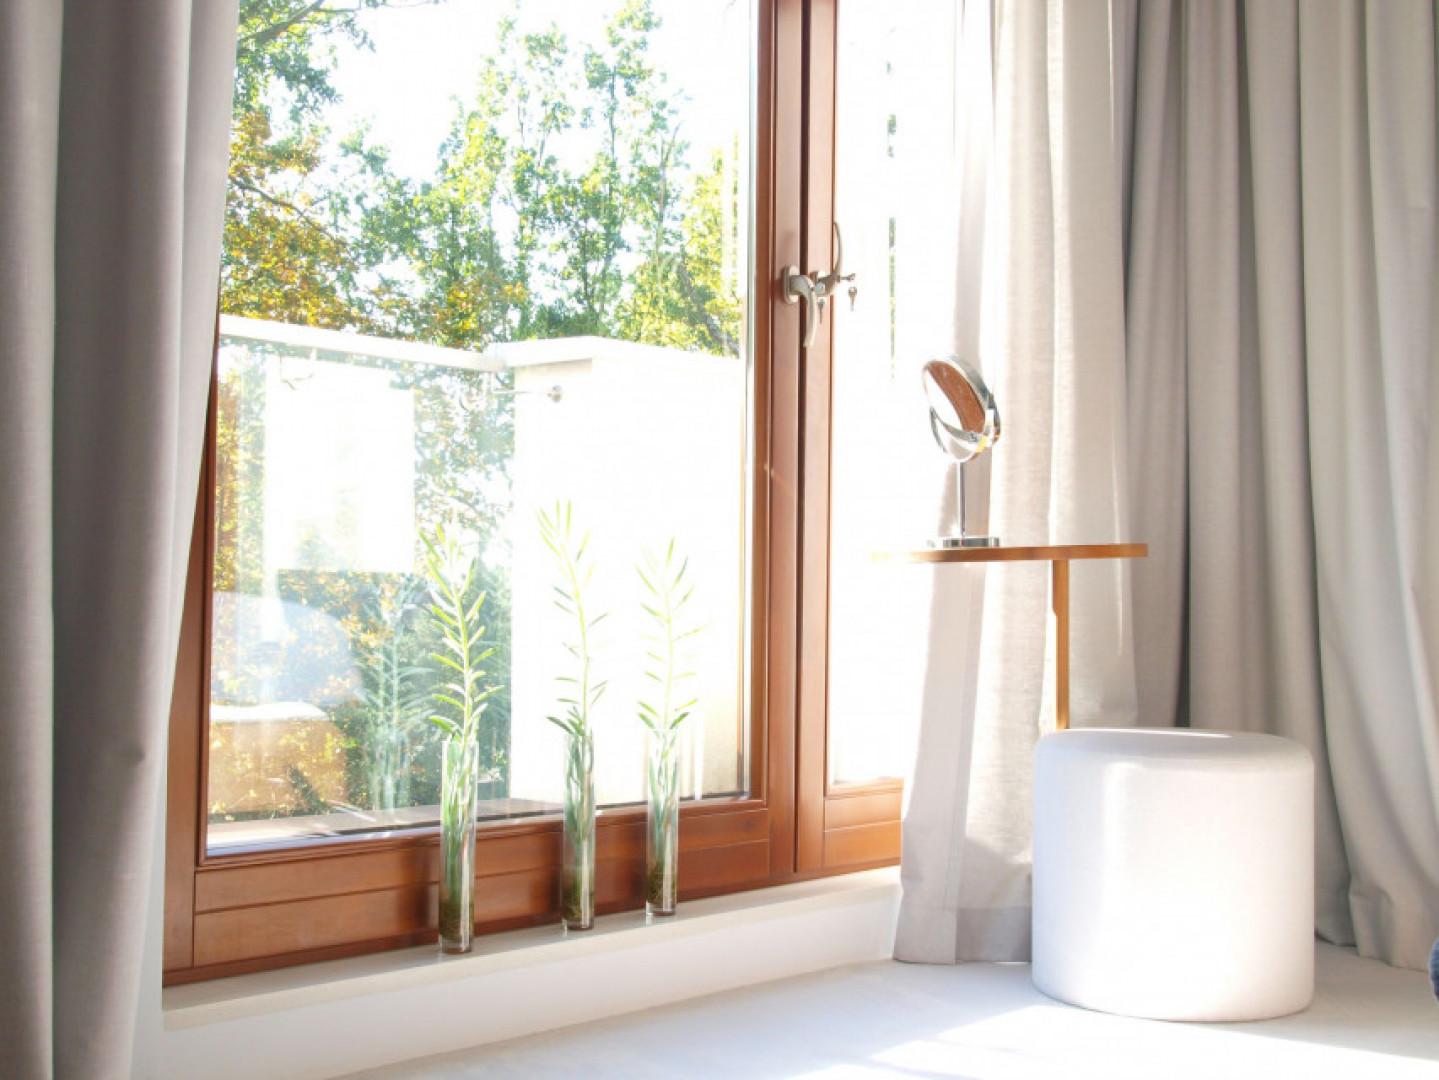 Toaletka Tolumi. Projekt: Katarzyna Dzięcioł. Fot. Karbonado